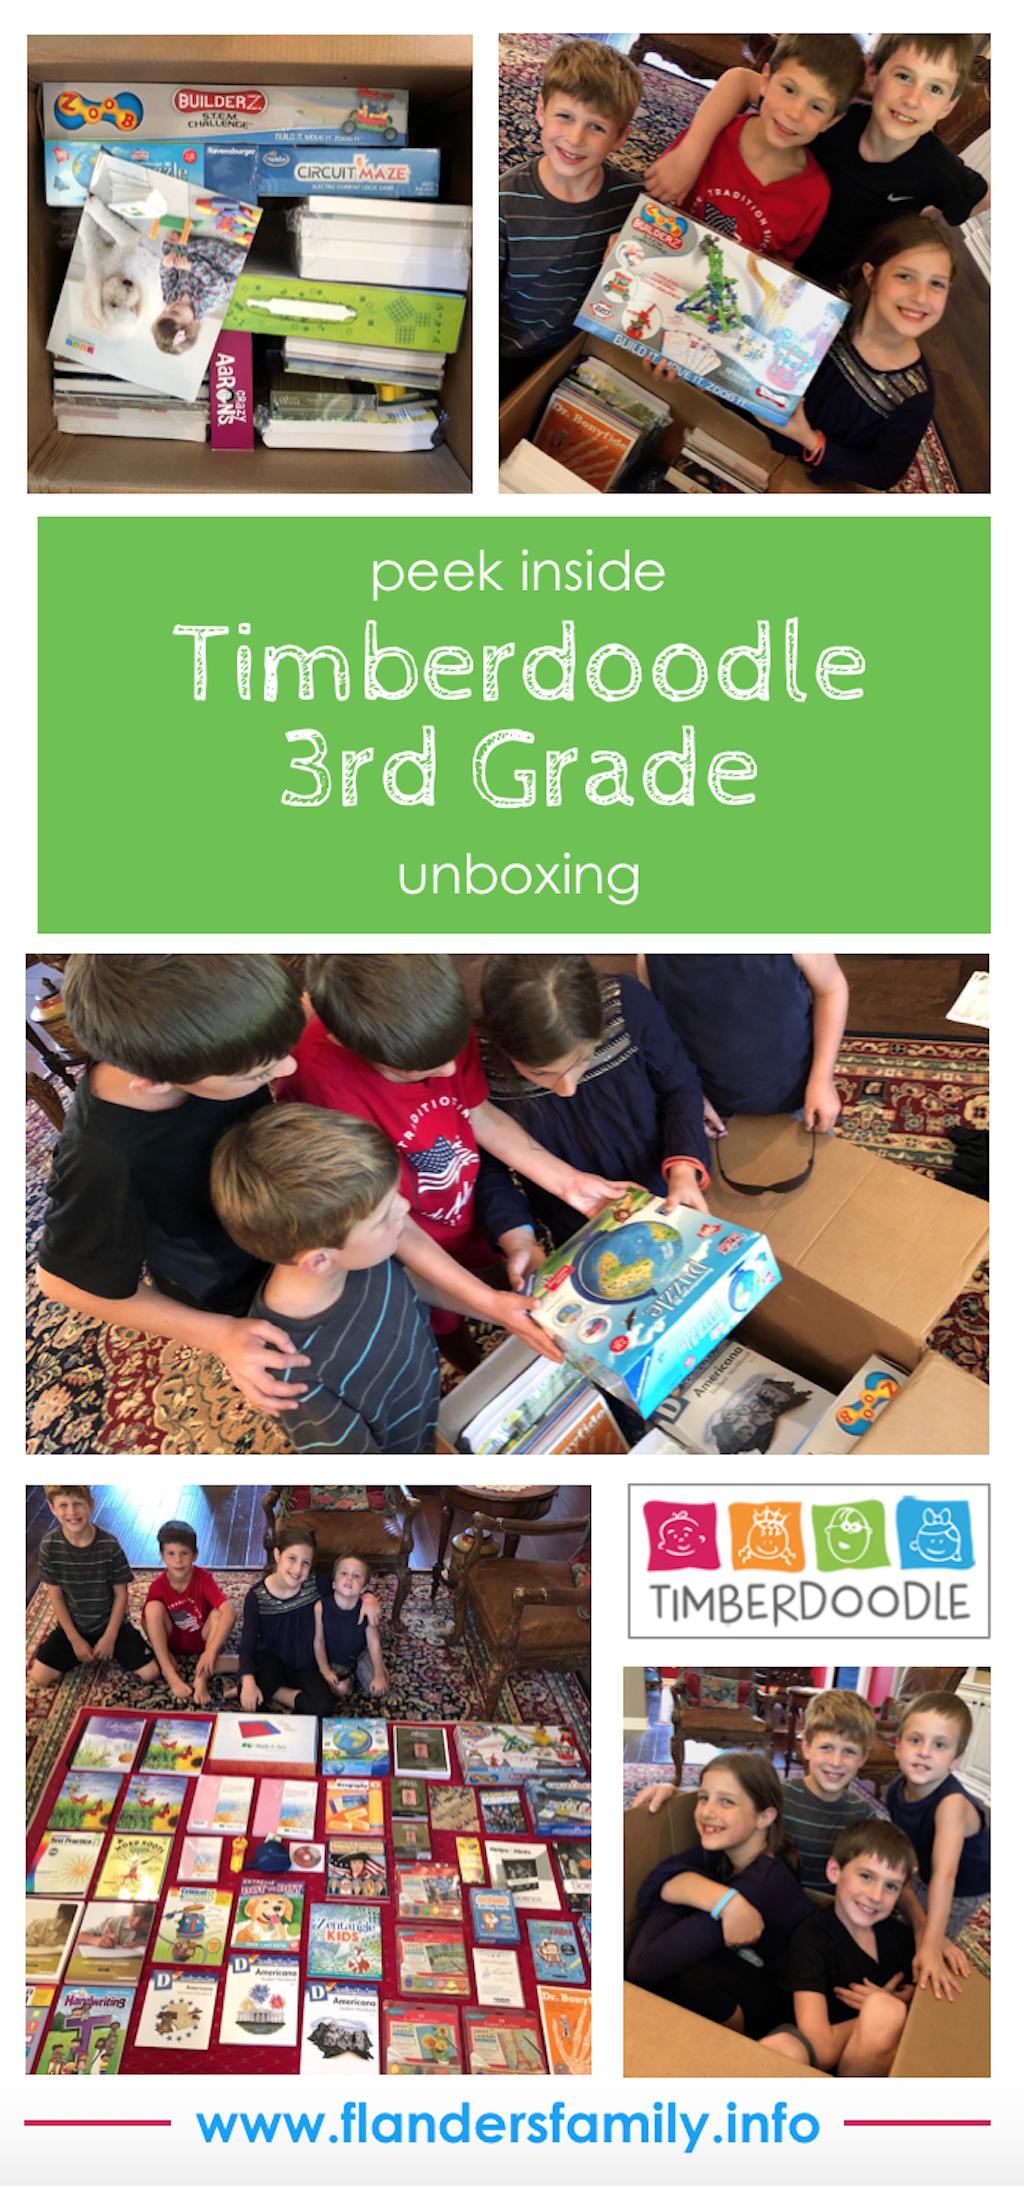 Timberdoodle 3rd grade